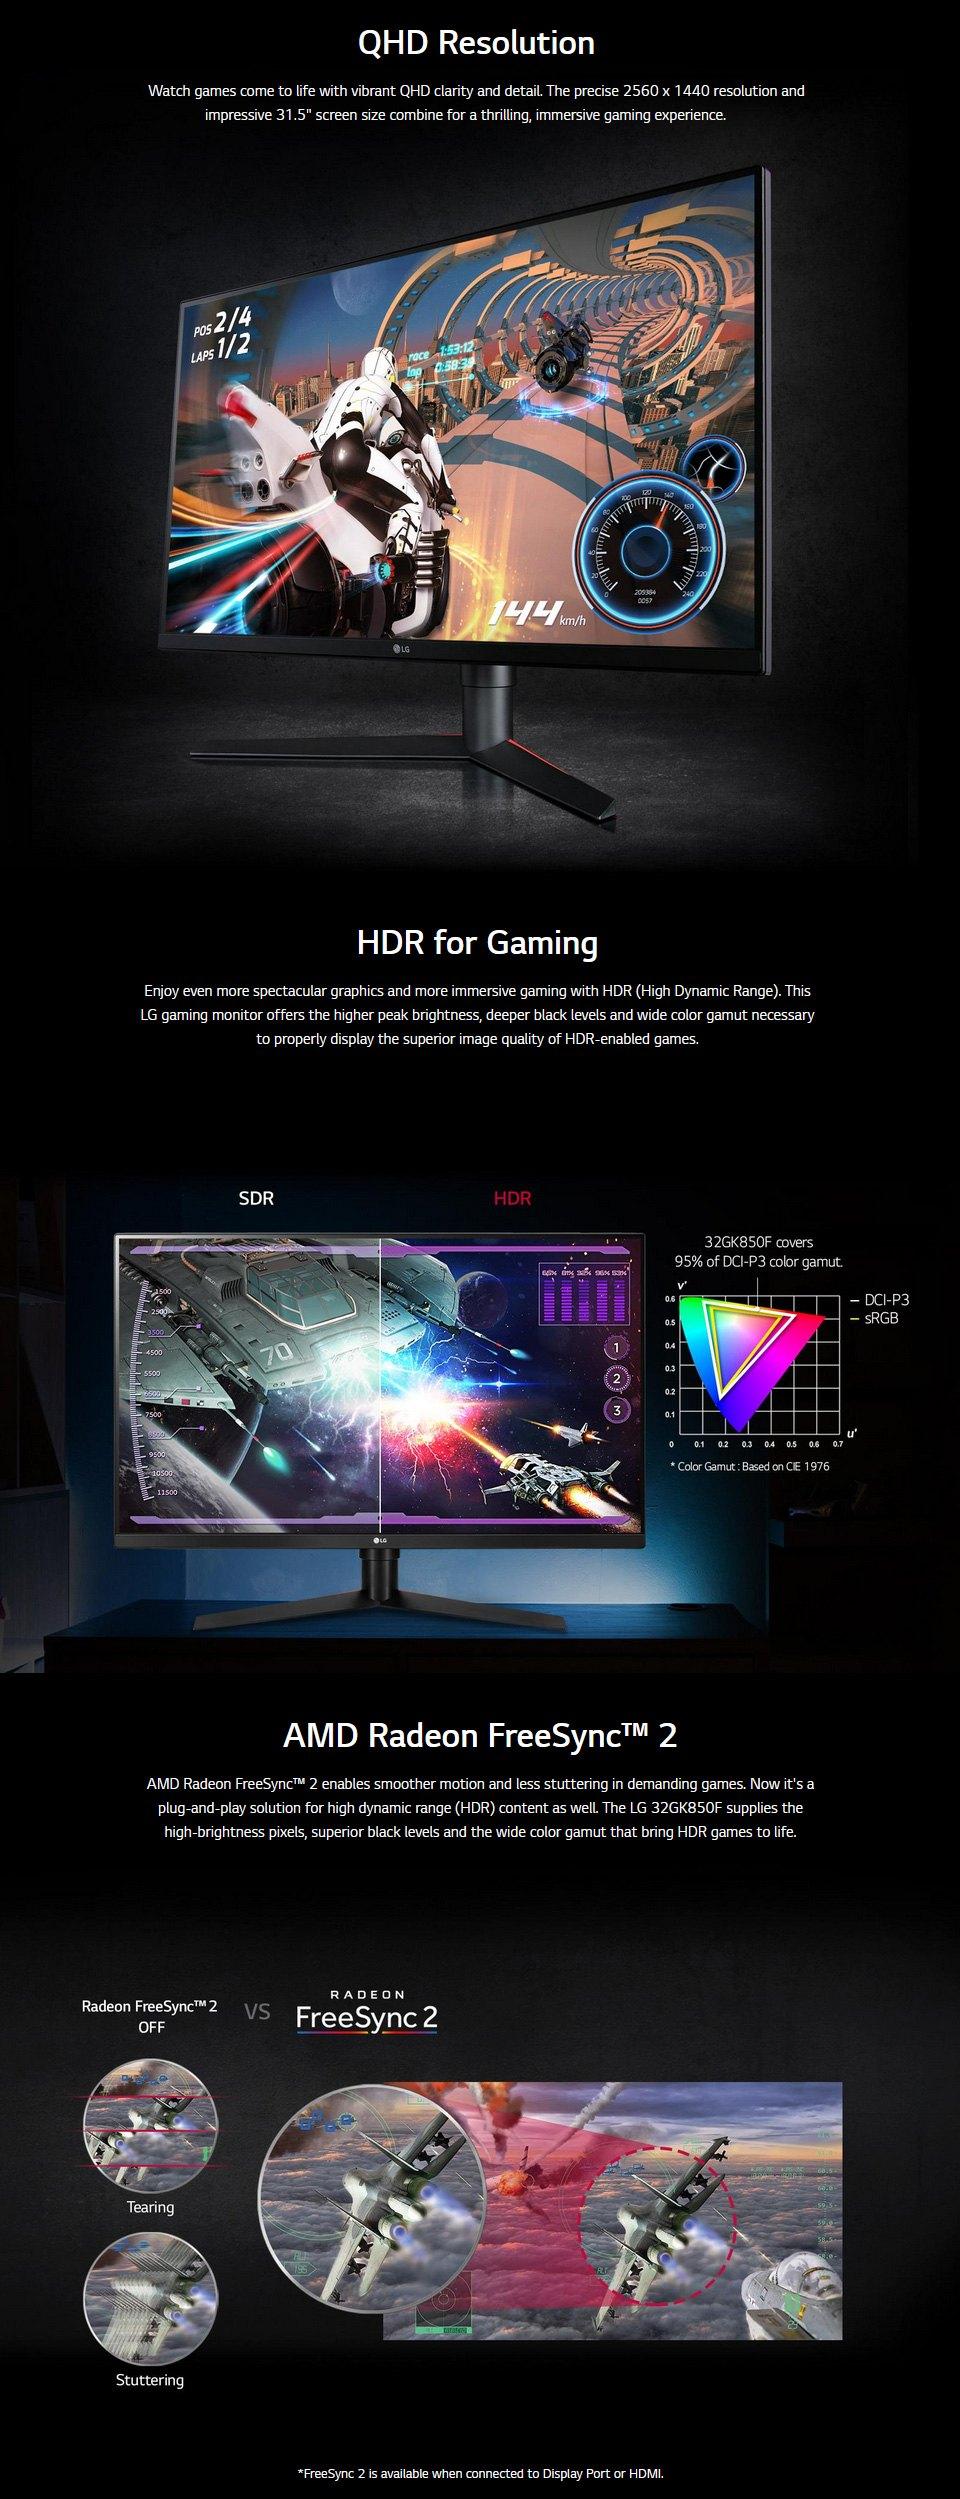 LG UltraGear 144Hz QHD 32in Monitor features